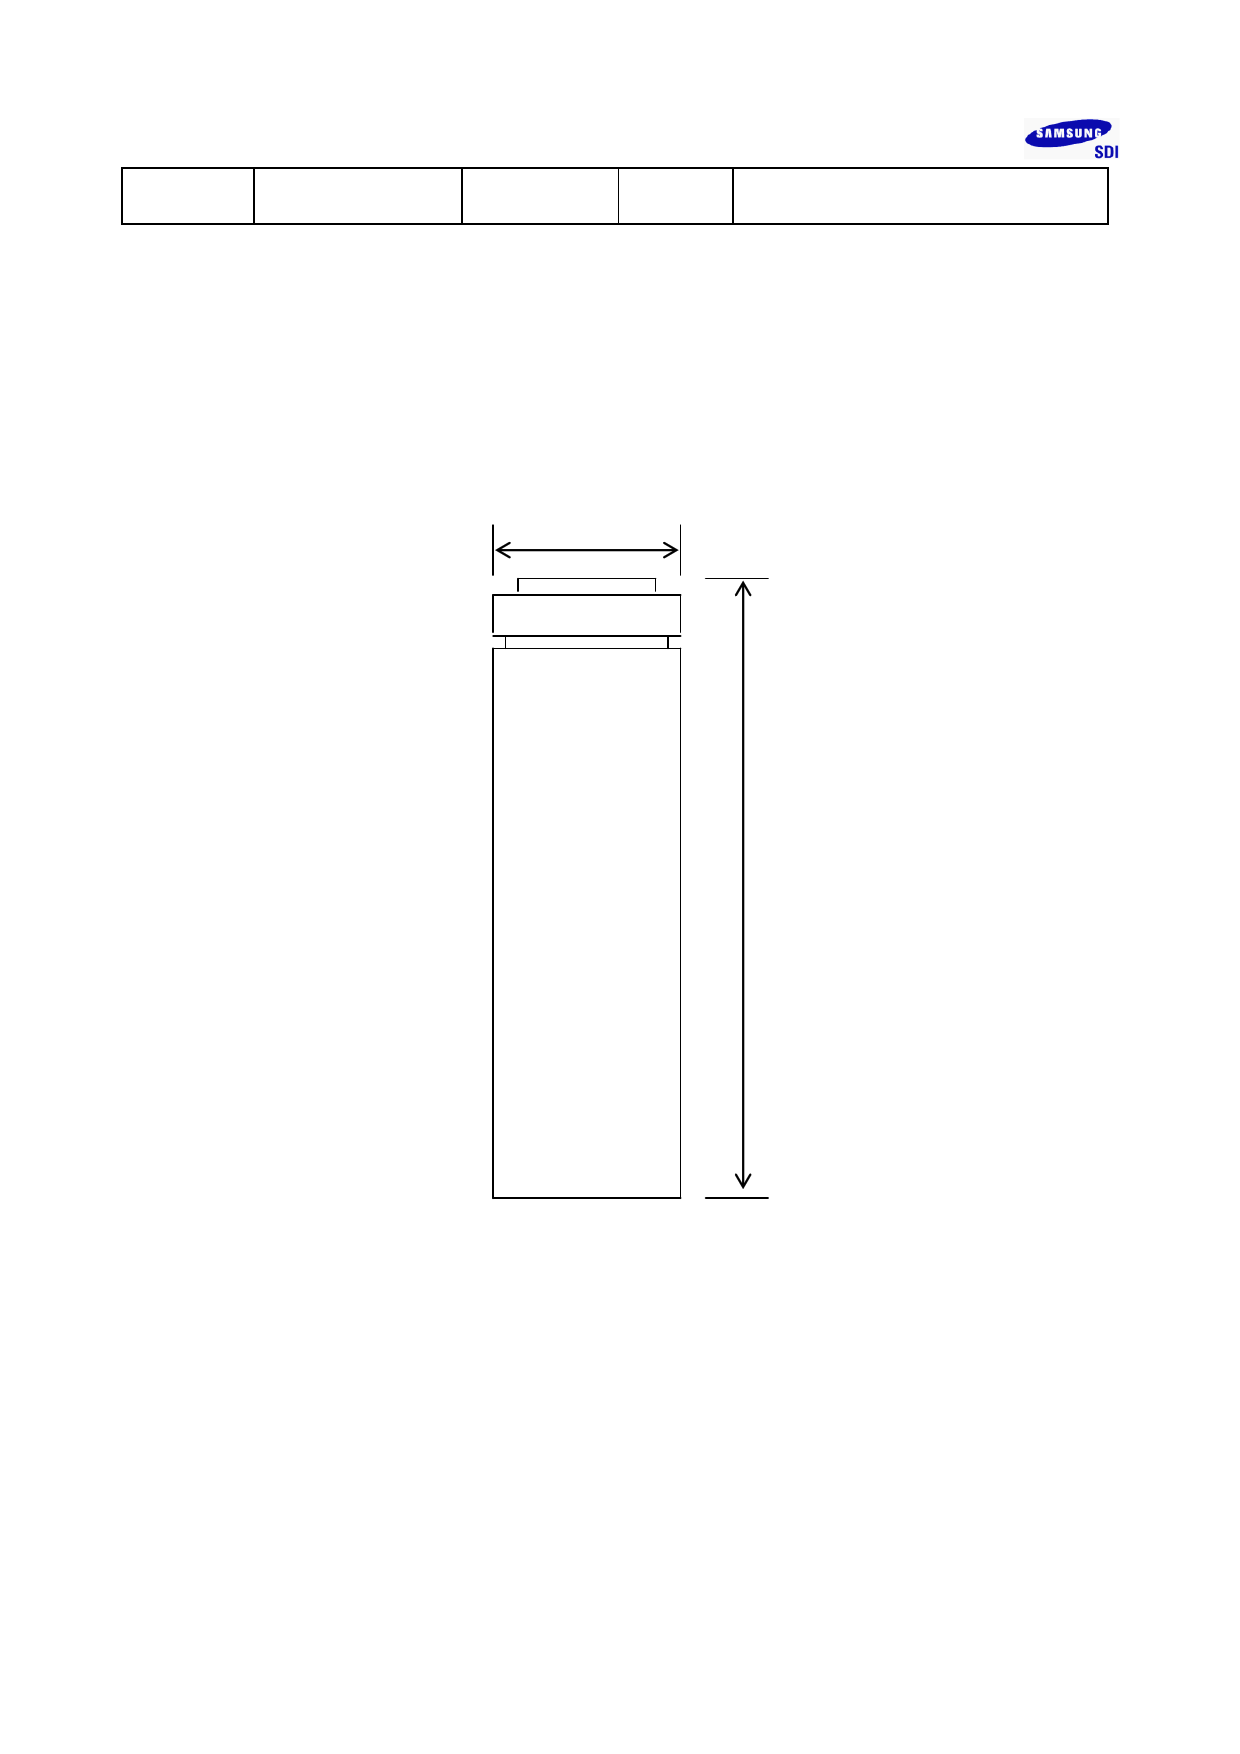 INR18650-20Q 전자부품, 판매, 대치품